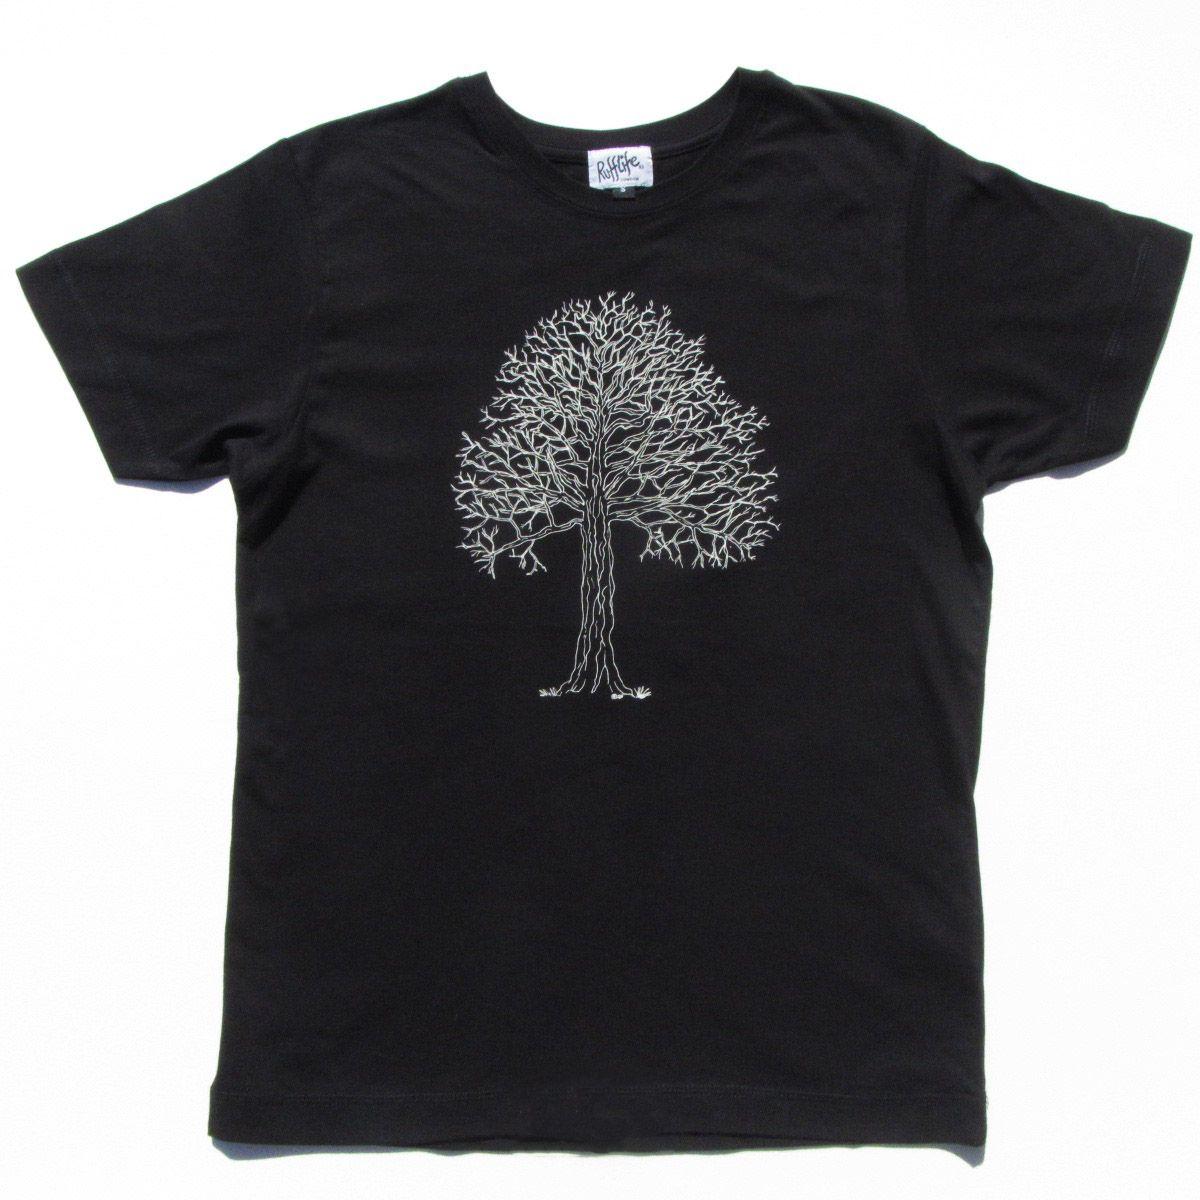 Tree on men's t-shirt